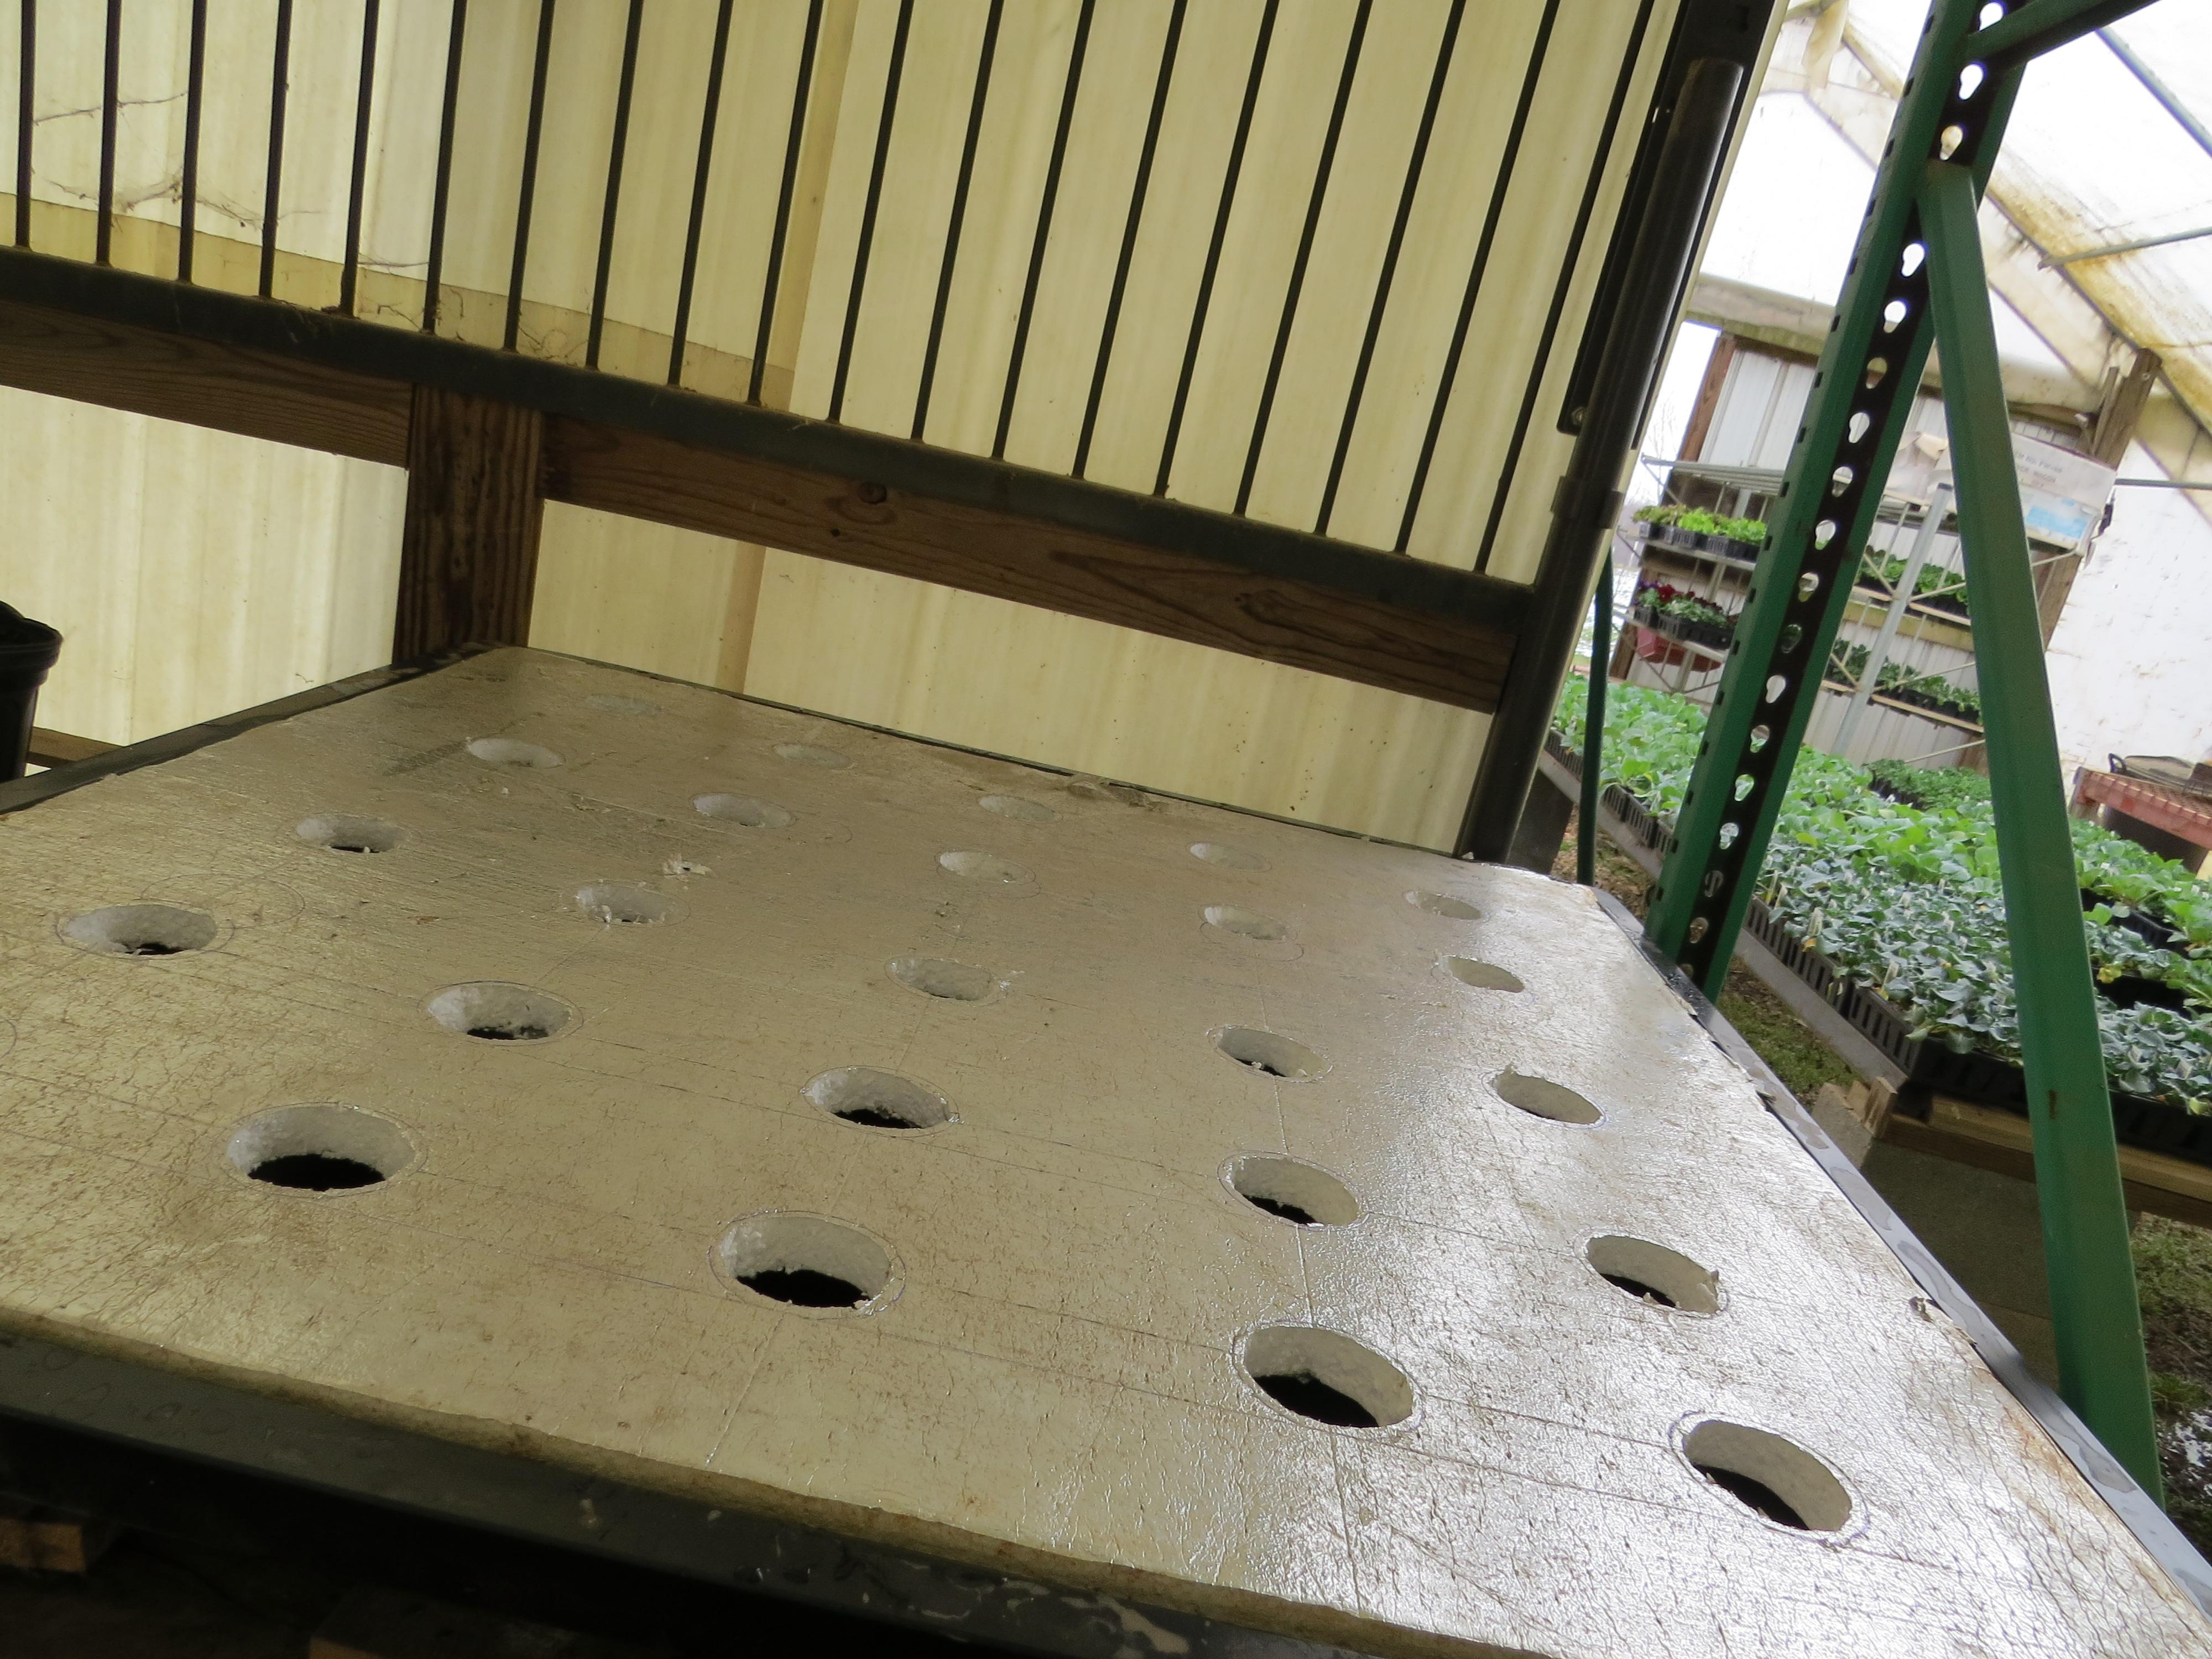 Flood Table Hydroponics